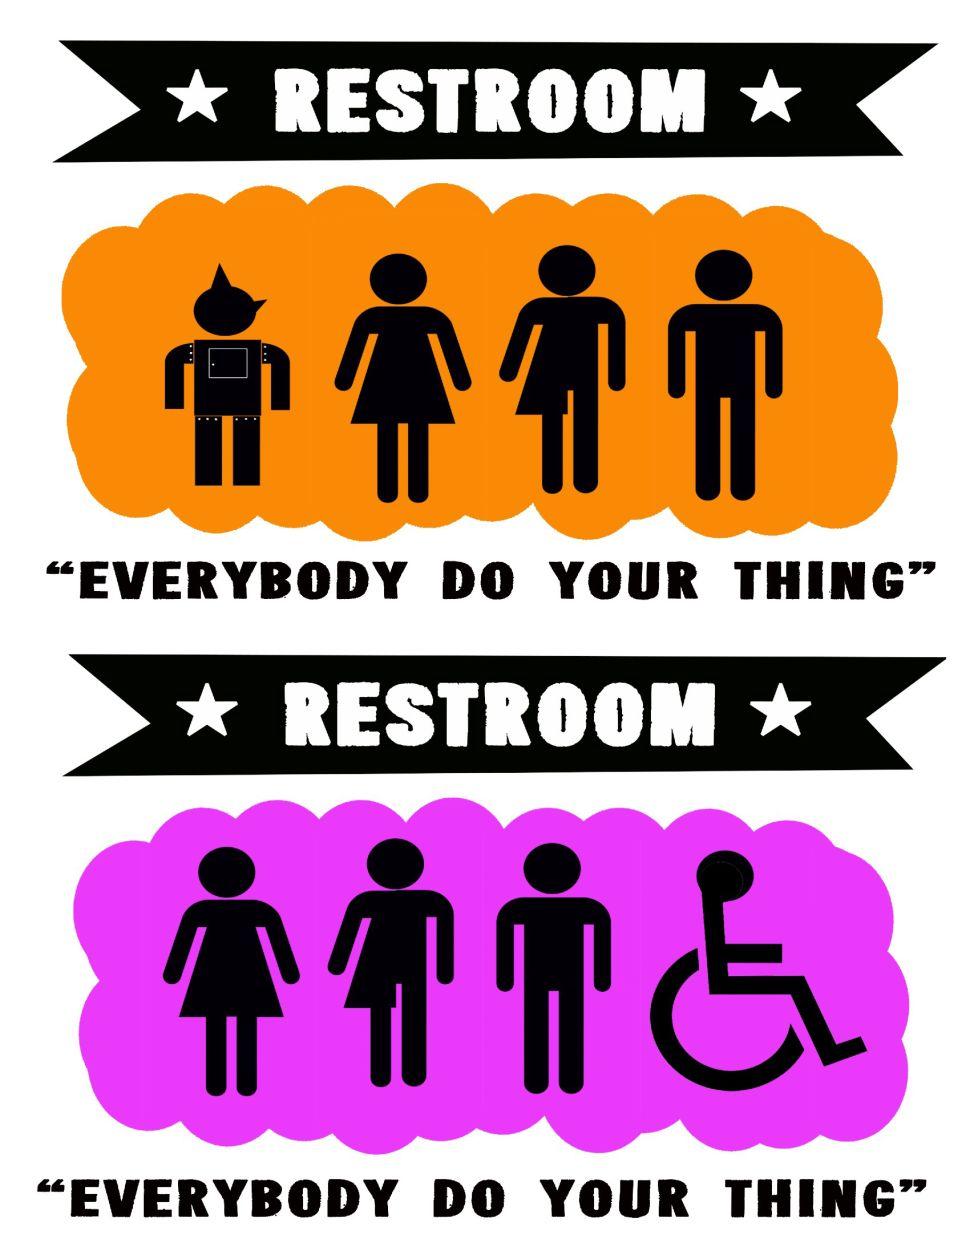 Bathroom Break: Designers Create New Generation of Gender-Neutral Restrooms